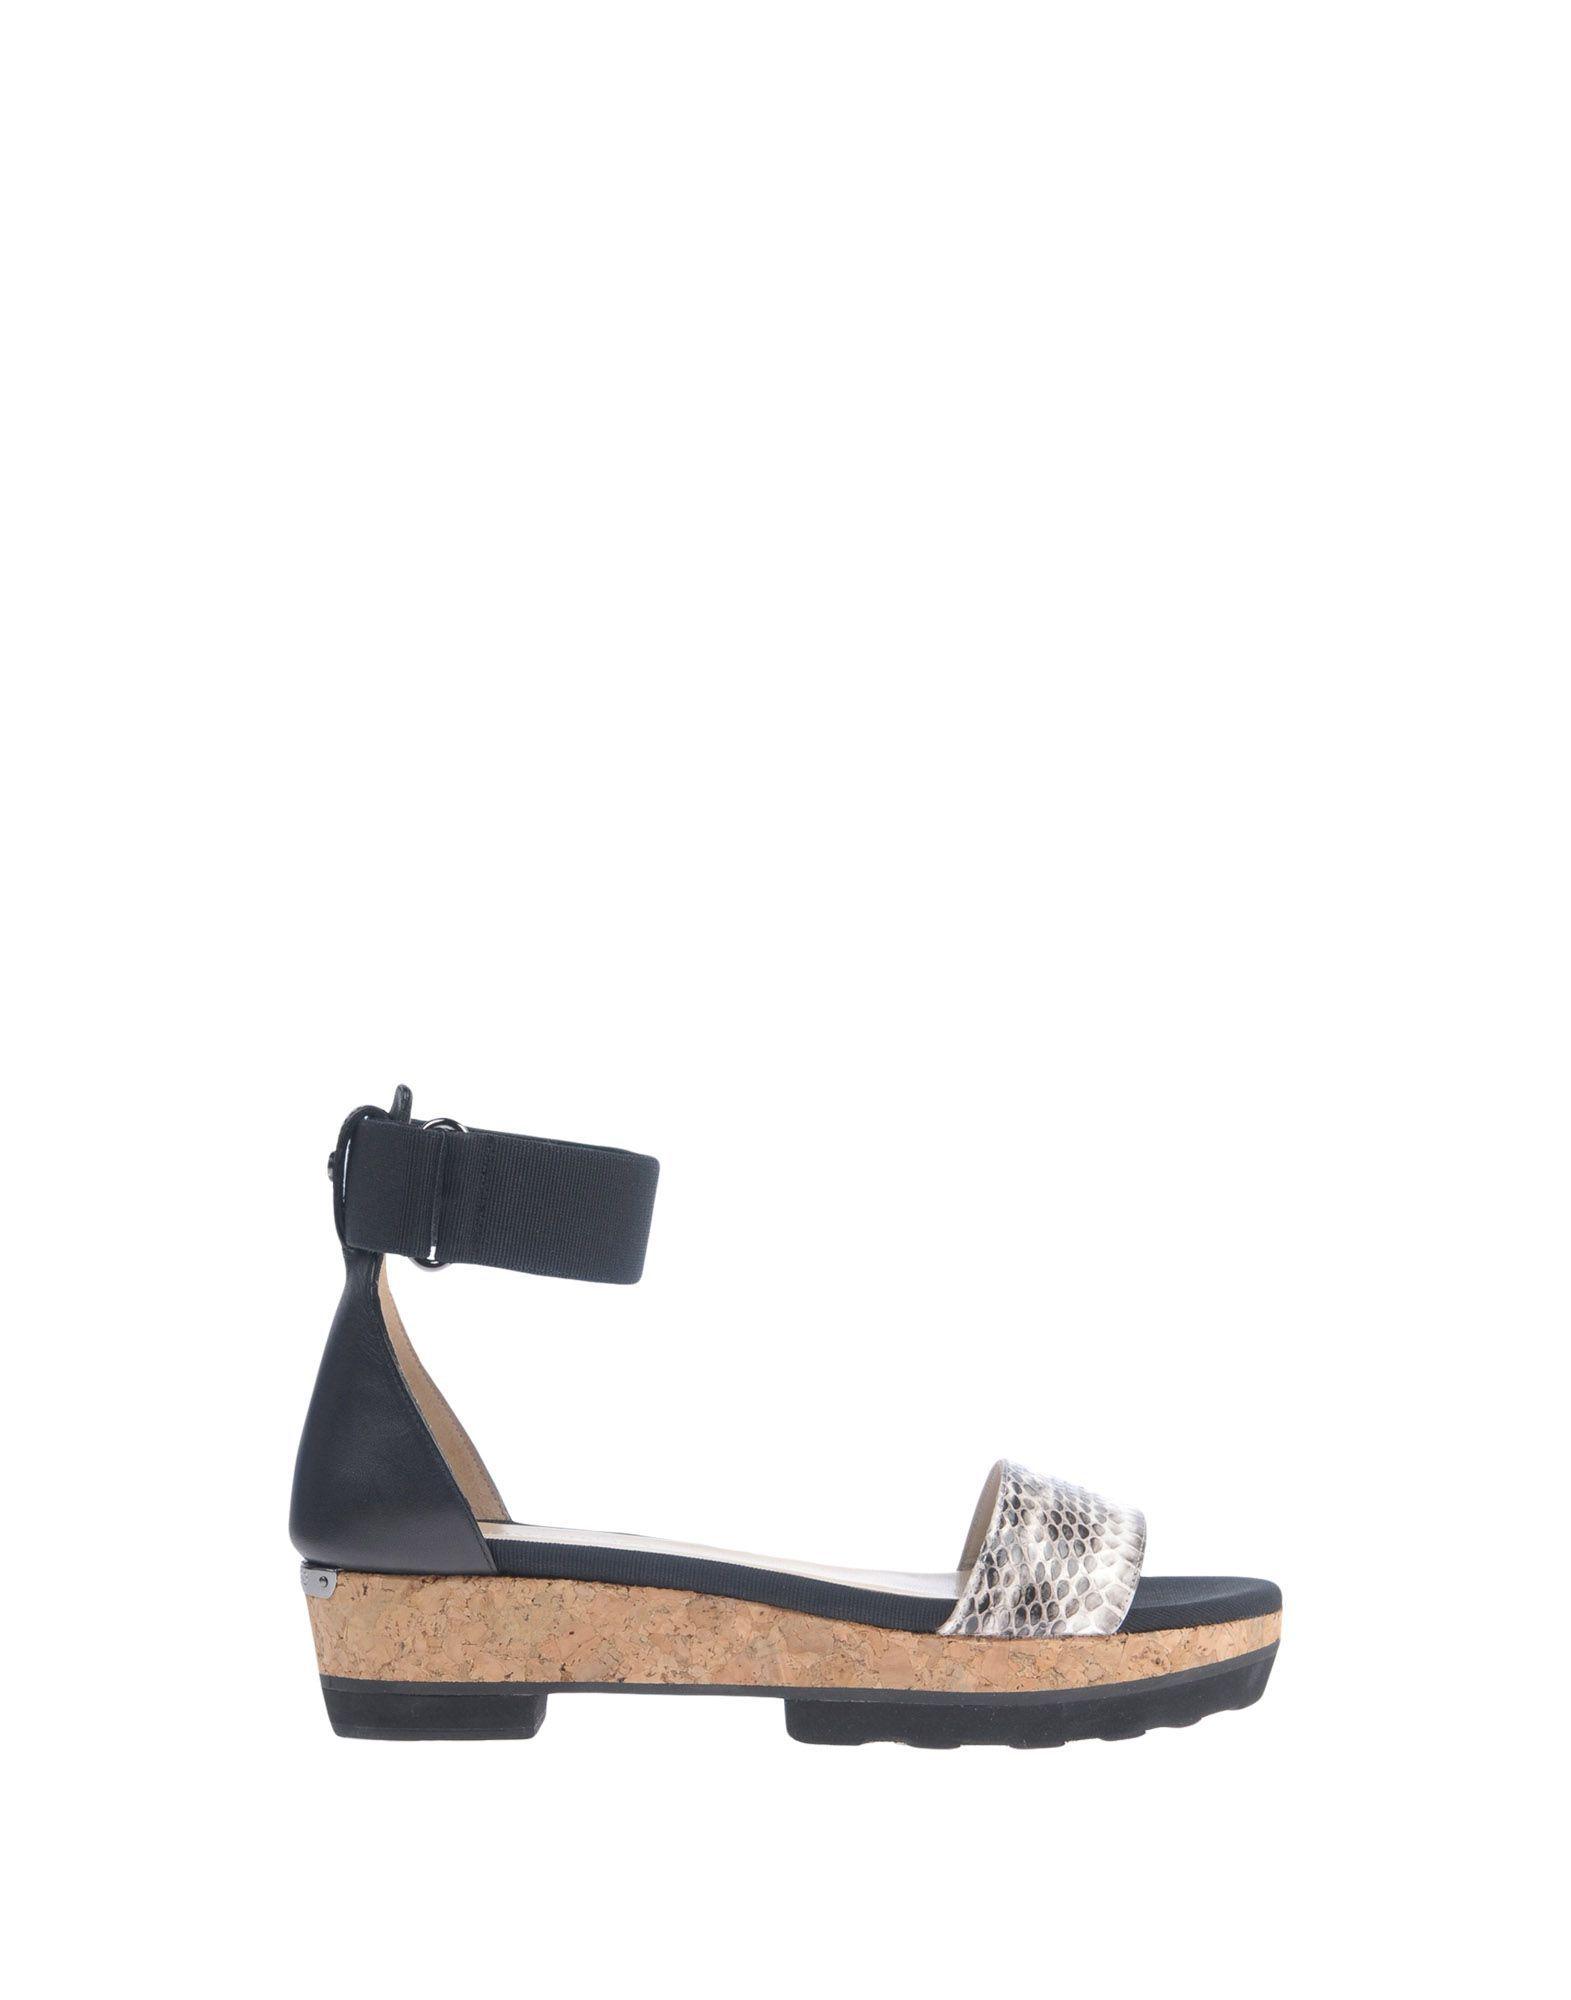 Jimmy Choo Black Leather Sandals